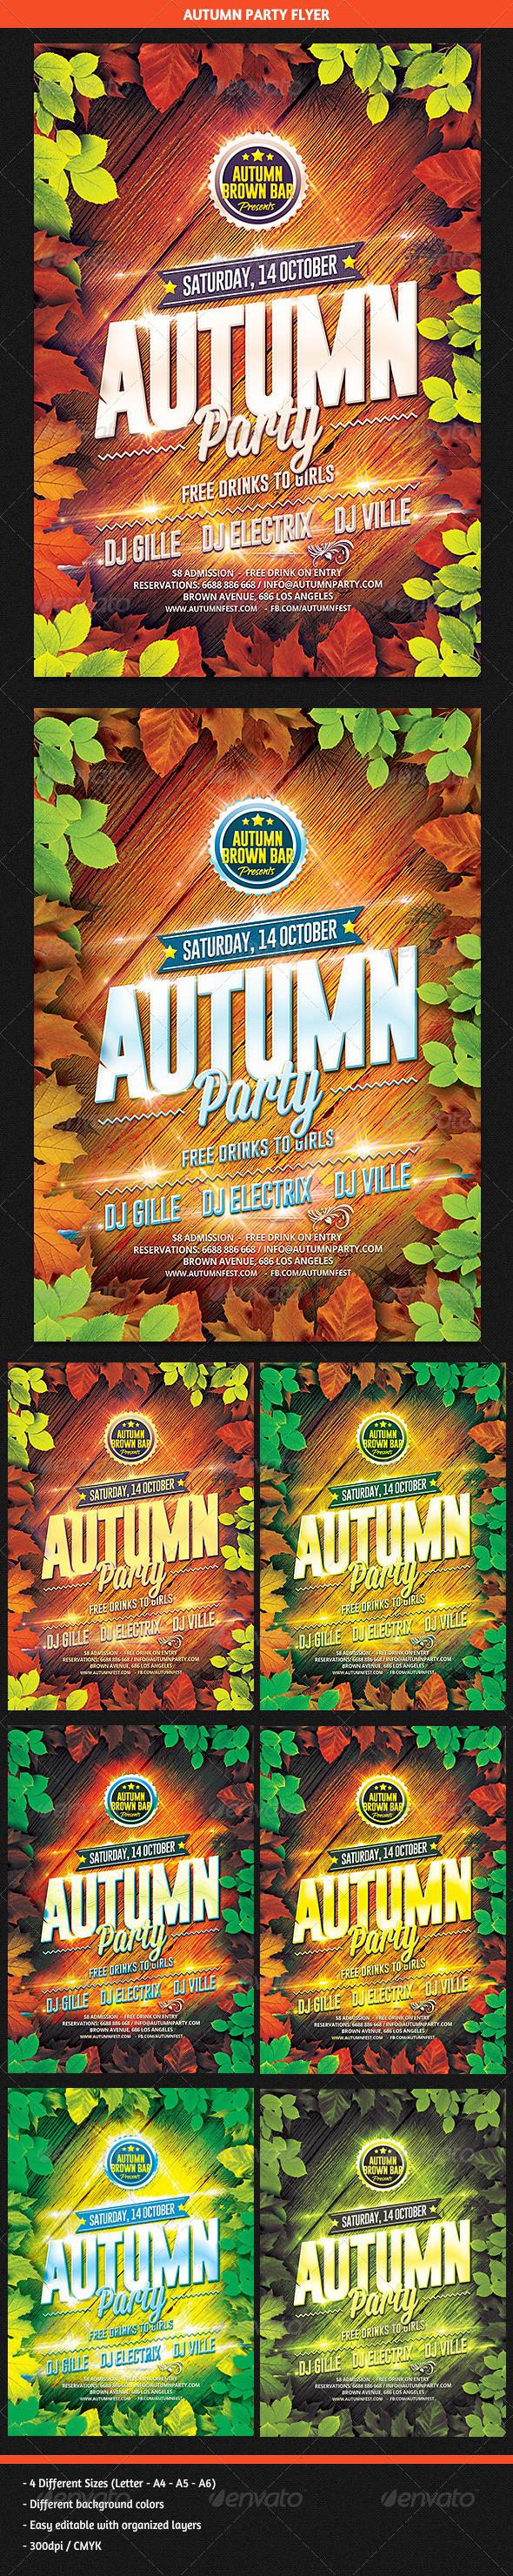 GraphicRiver Autumn Party Flyer 8640349